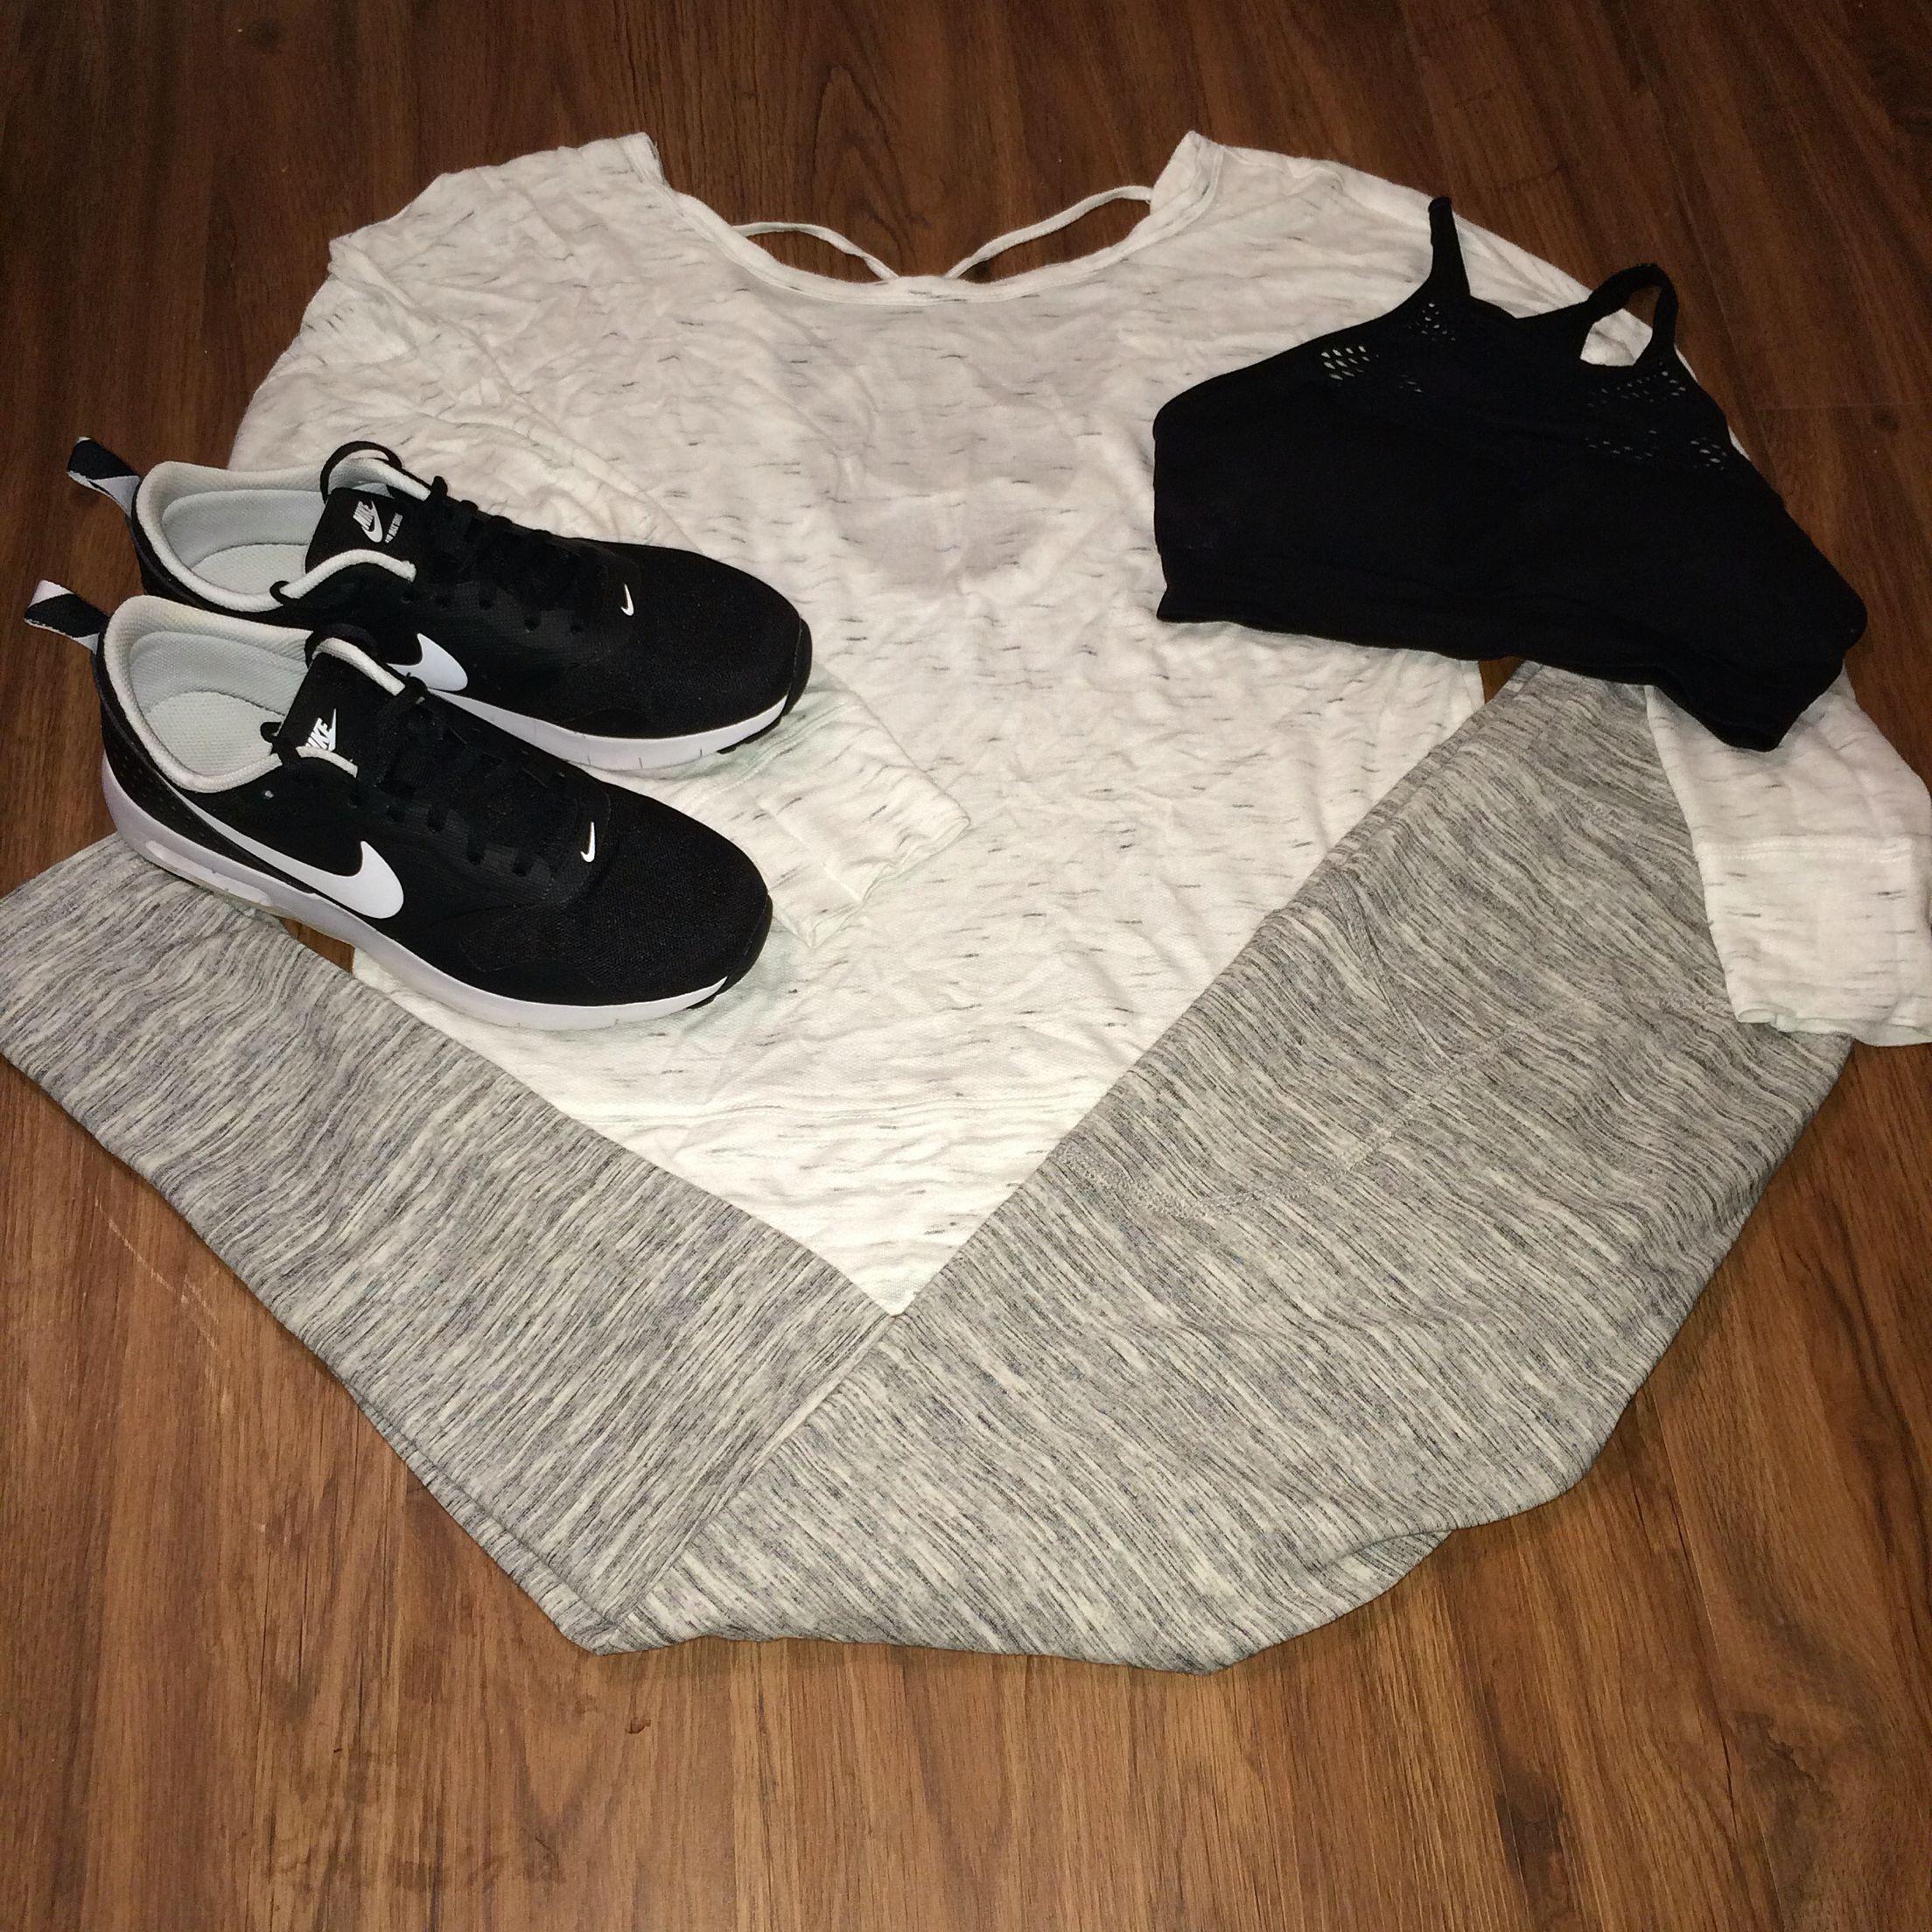 Meryl grey gym outfit, Nike tavas live love dream